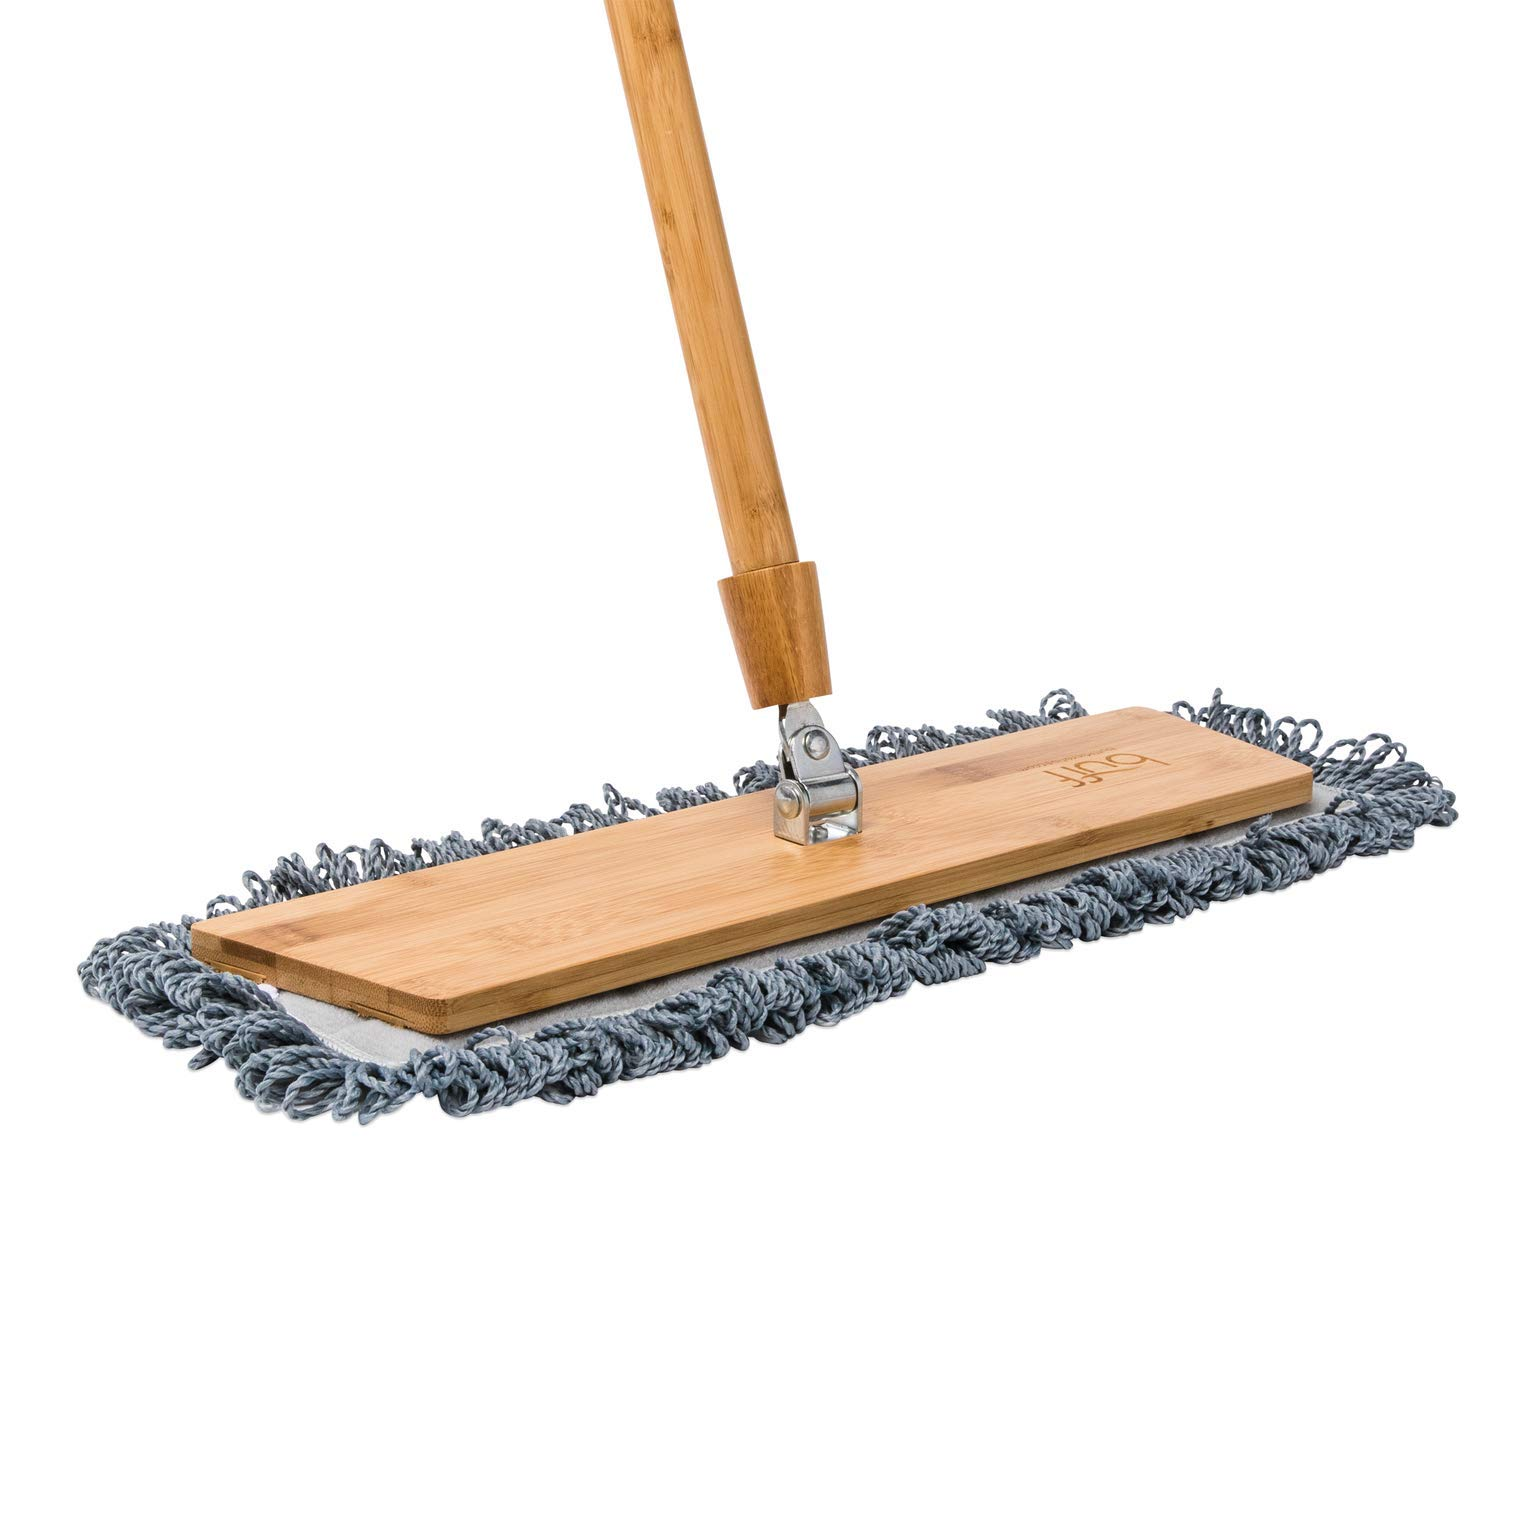 Buff Bamboo Microfiber Mop | Lightweight Dust Mop For Hardwood, Laminate, Tile, Concrete Floors | Microfiber Wholesale